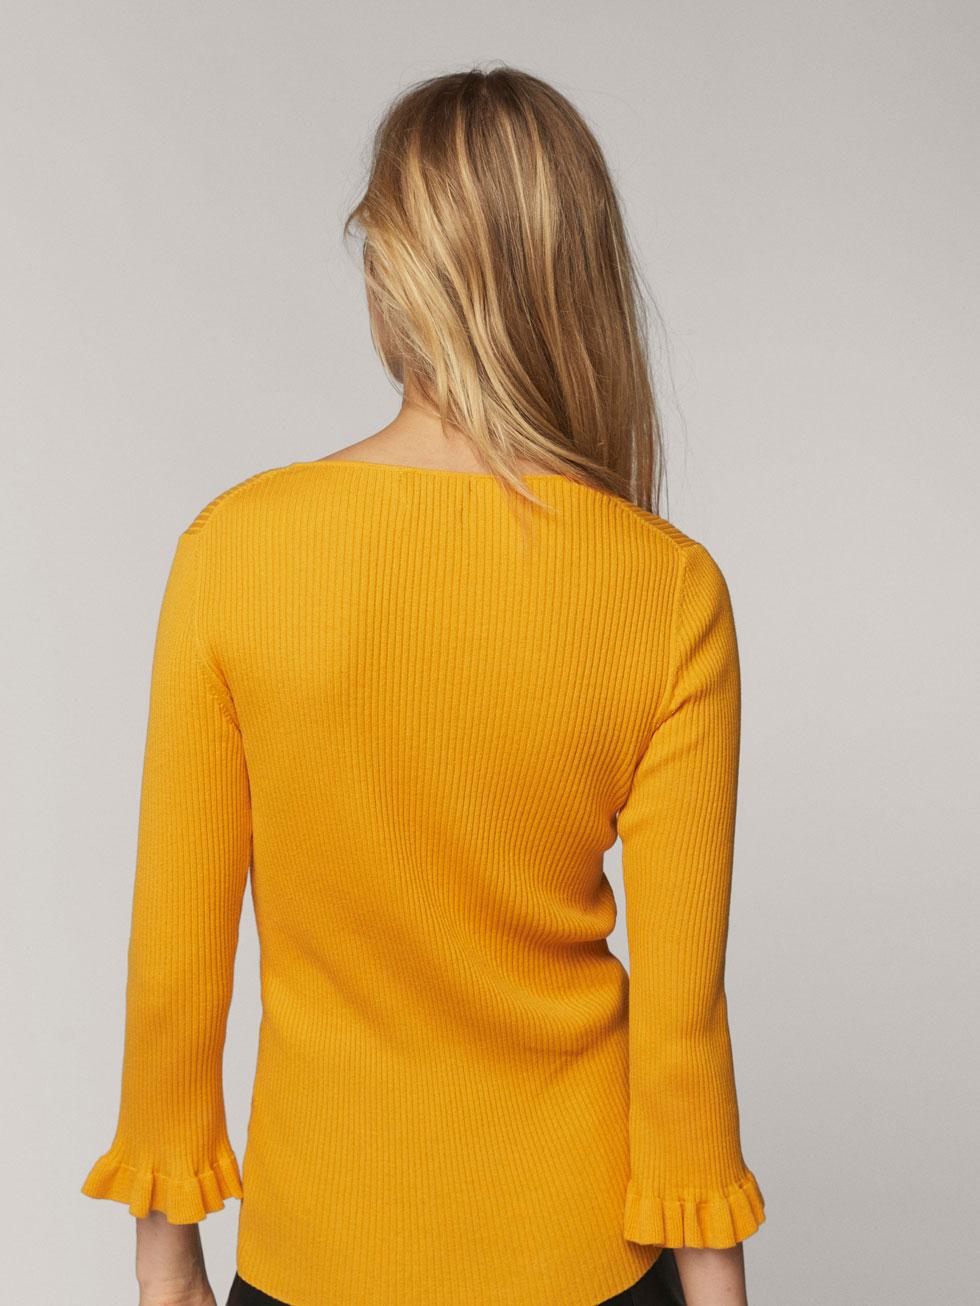 Sweaters & Cardigans - SALE - Massimo Dutti